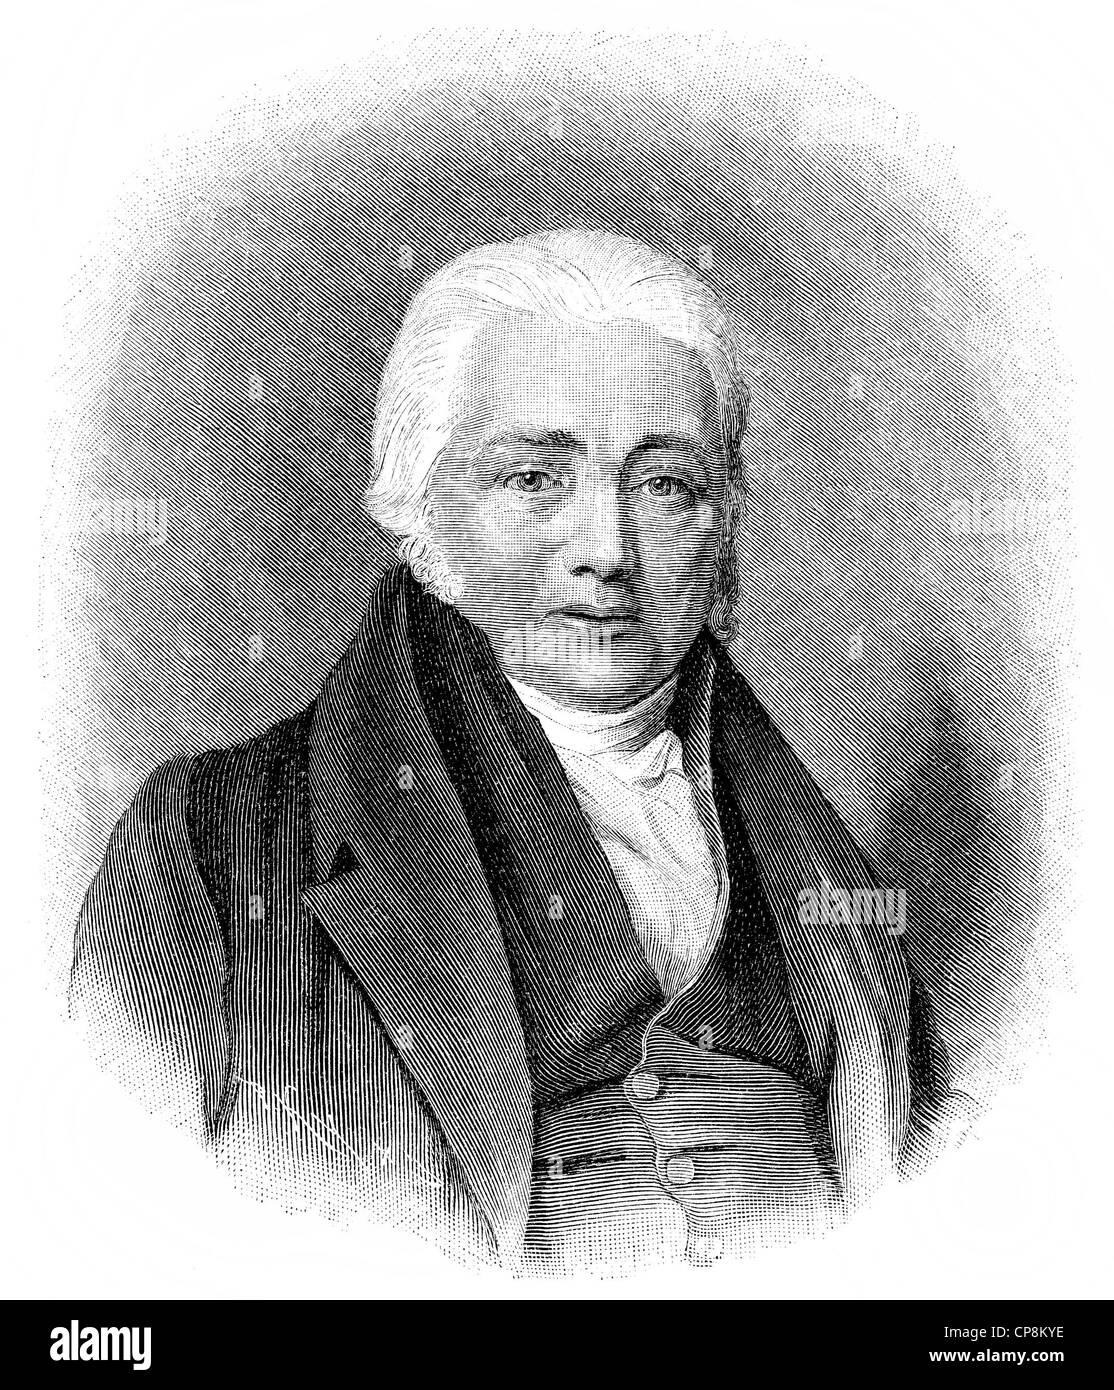 Samuel Taylor Coleridge, 1772 - 1834, an English Romantic poet, critic and philosopher, Historische Zeichnung aus - Stock Image